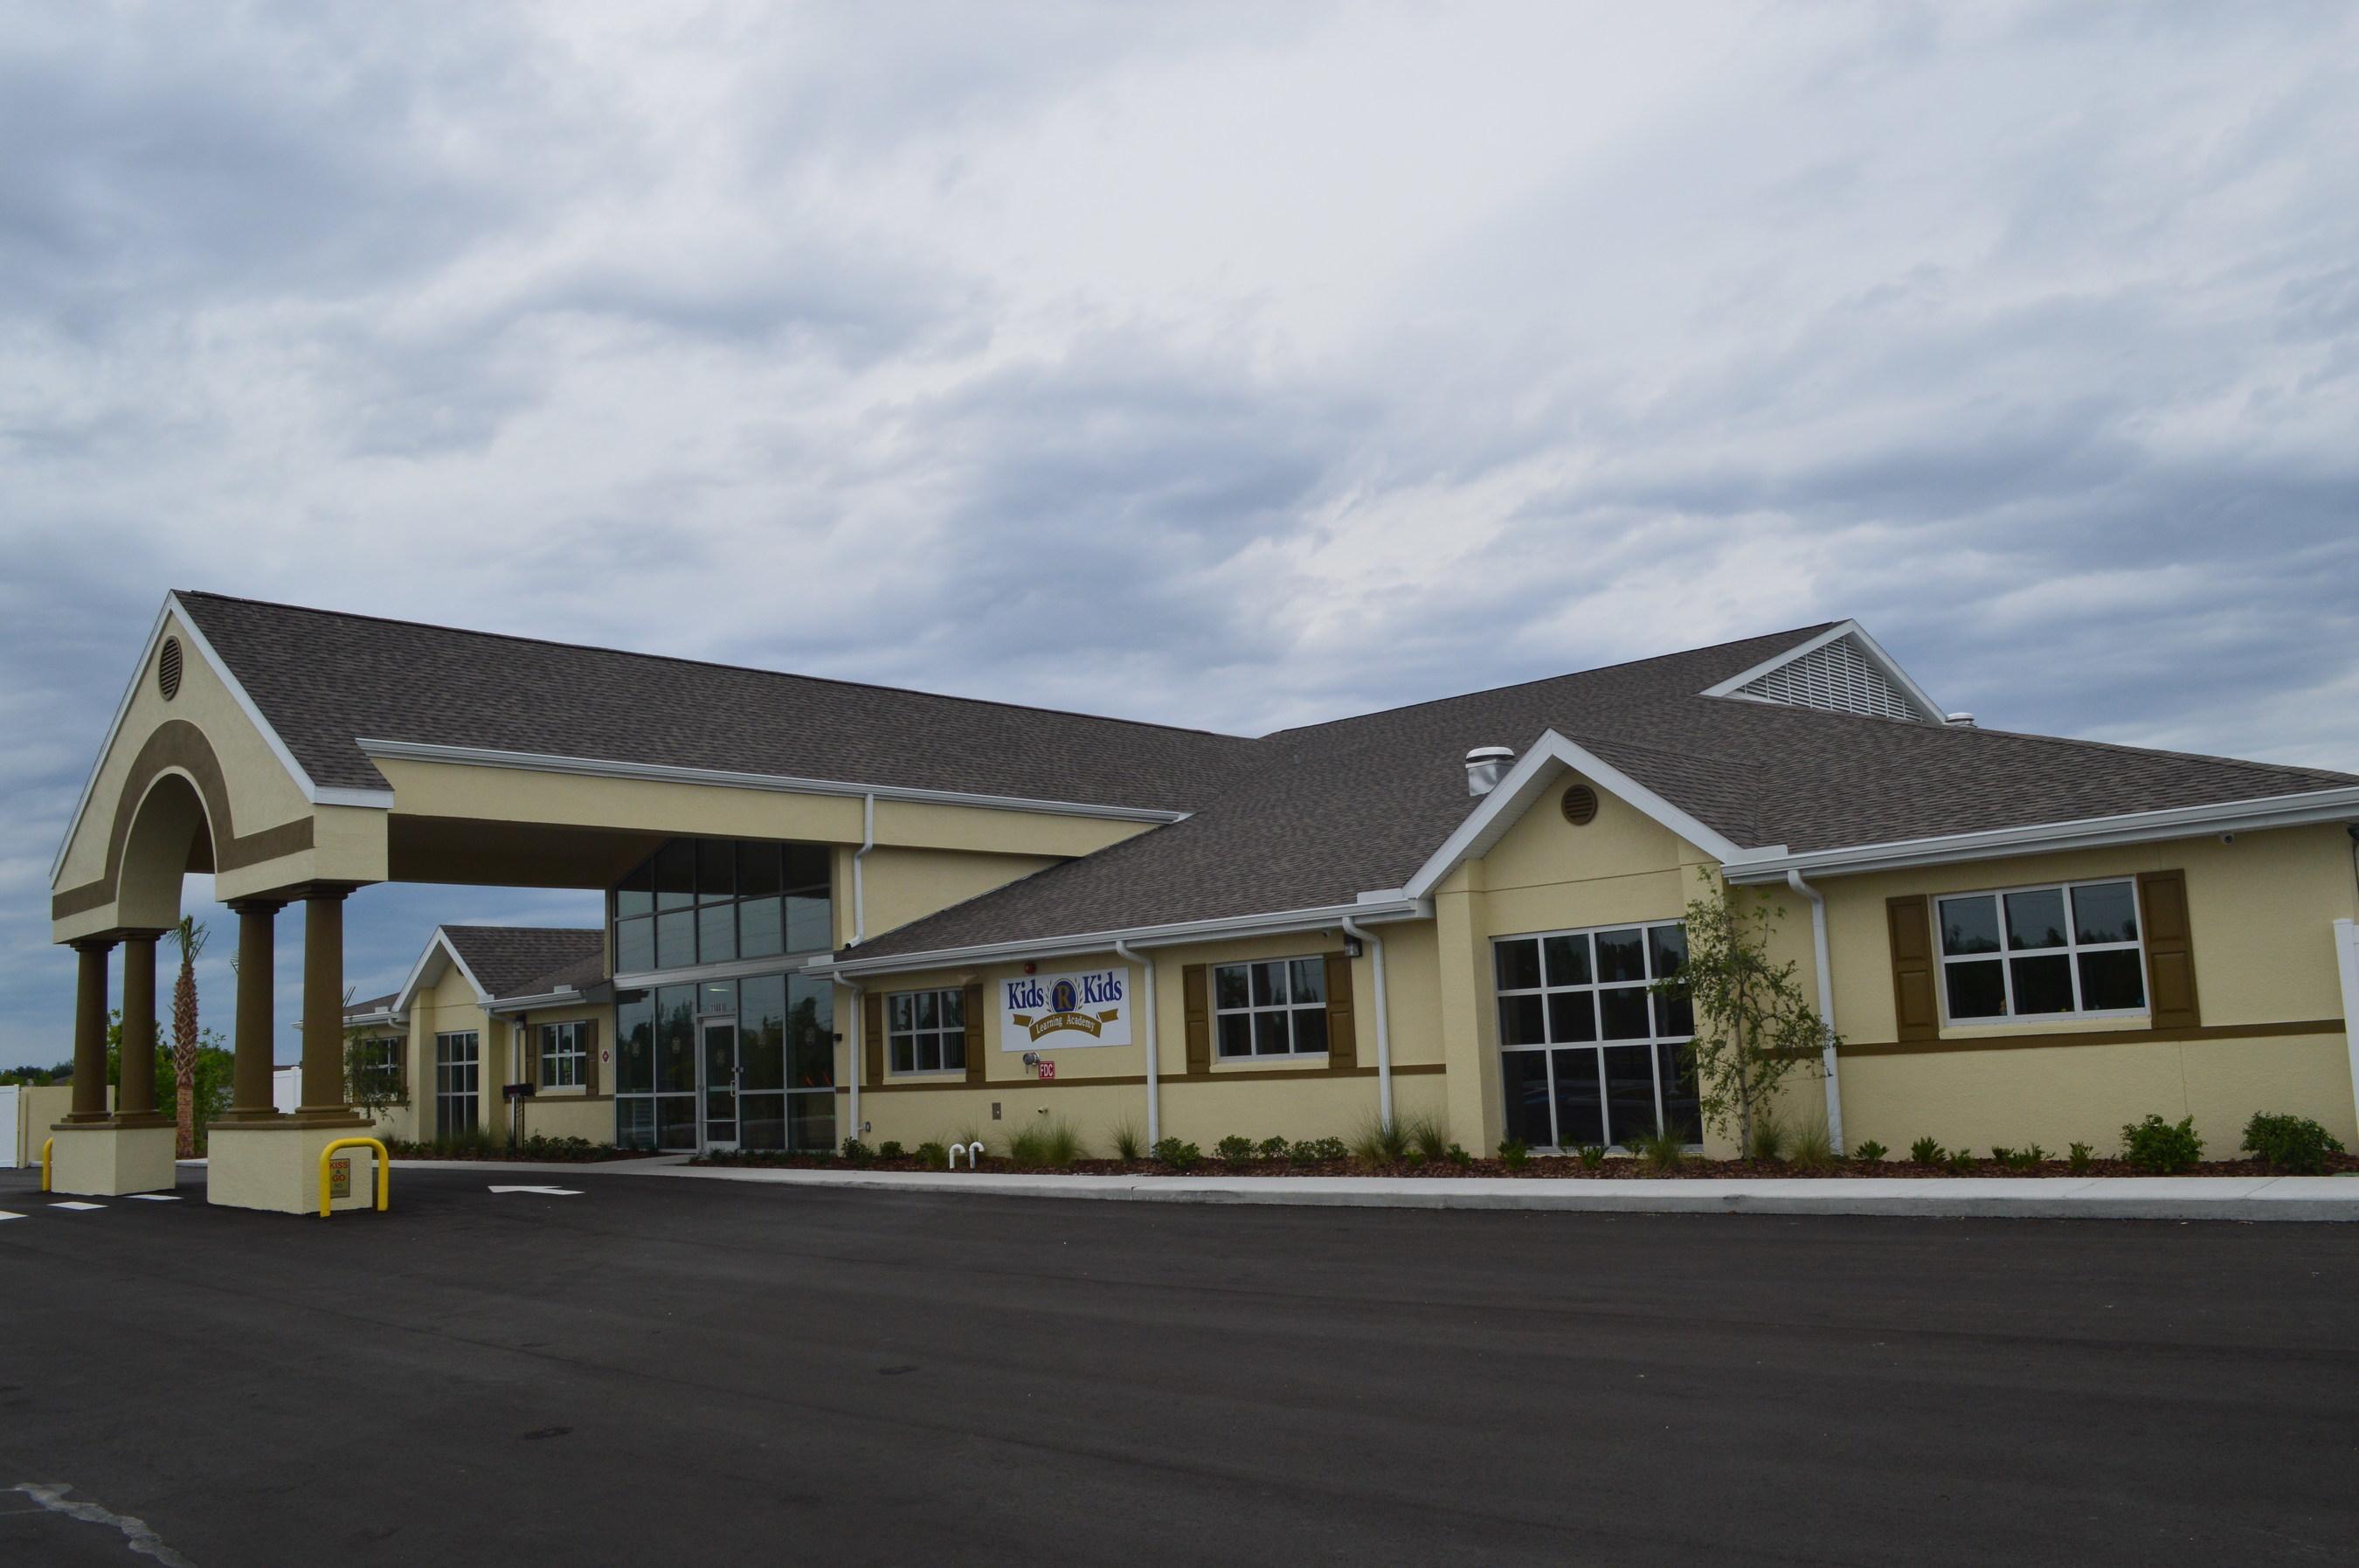 Kids 'R' Kids Learning Academy Now Open in New Port Richey, Fla.